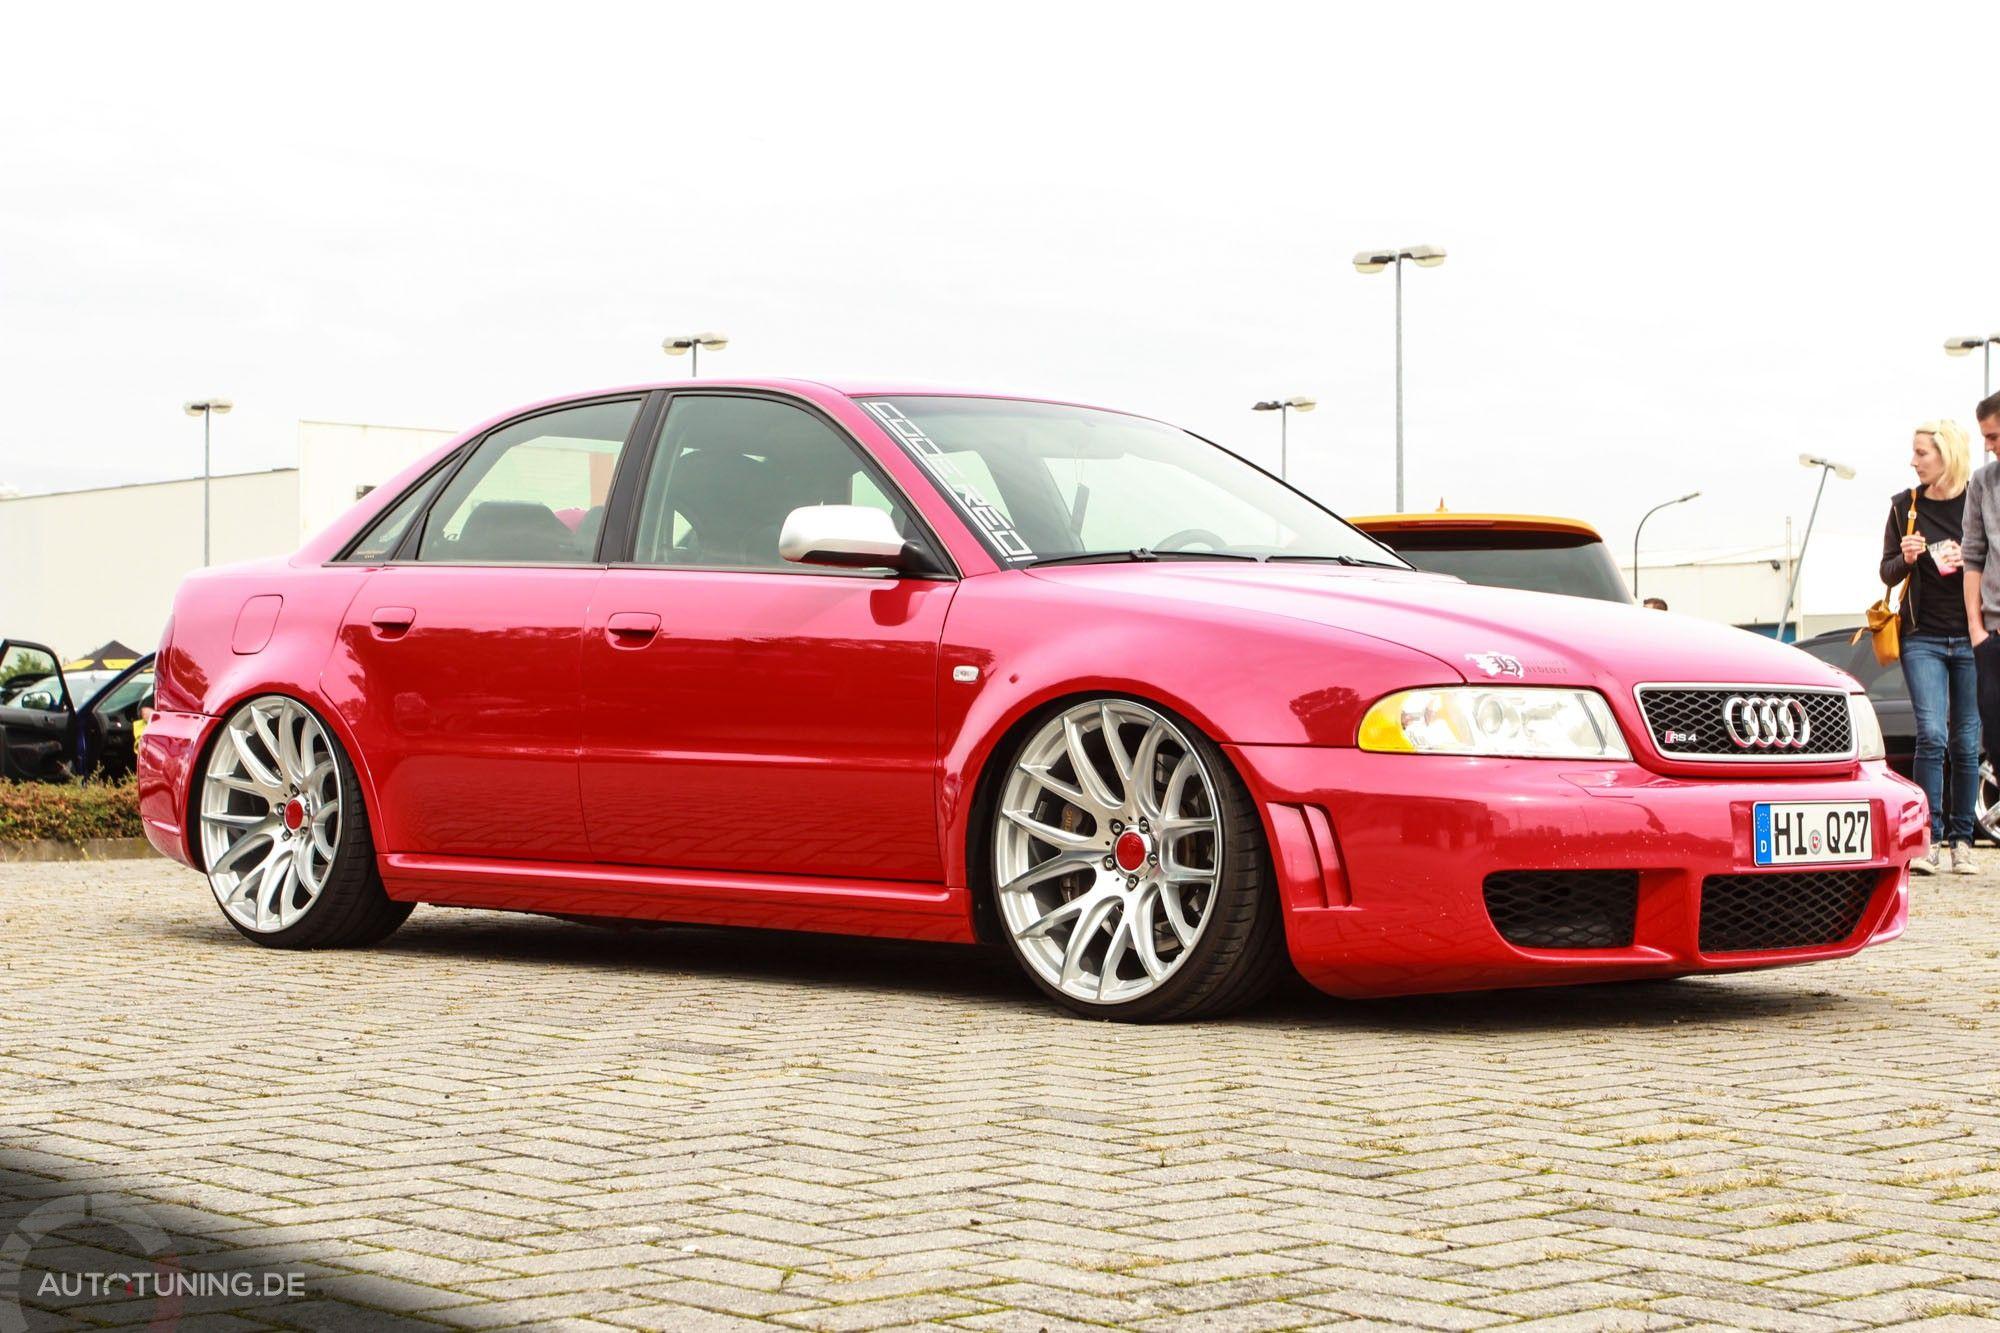 Audi S4 Das Rote Monster Vom Saunaclub Audi S4 Audi Rs4 Audi